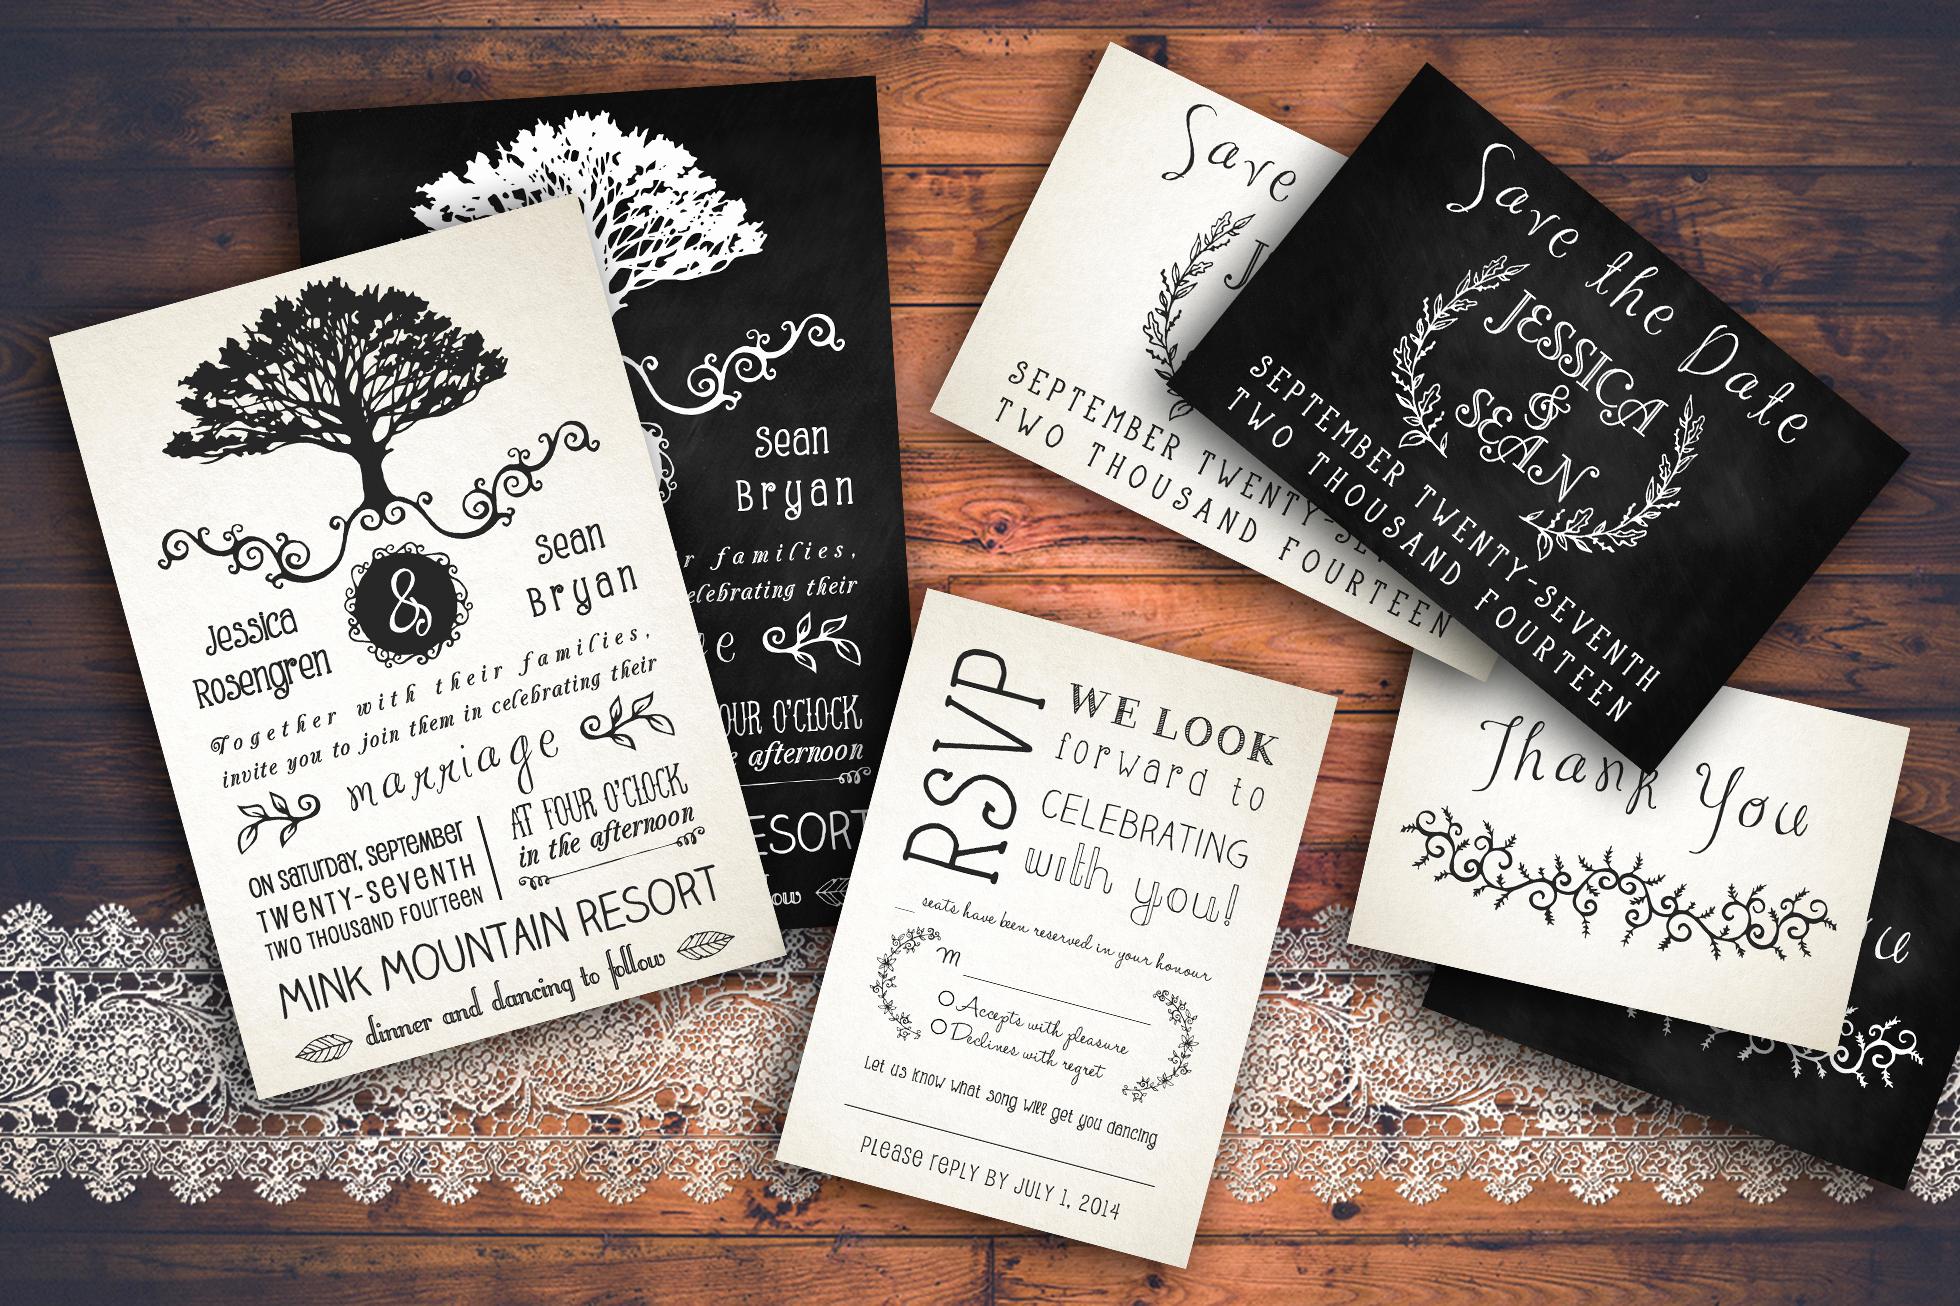 Rustic Wedding Invitation Templates Fresh Rustic Wedding Invitation Pack Invitation Templates On